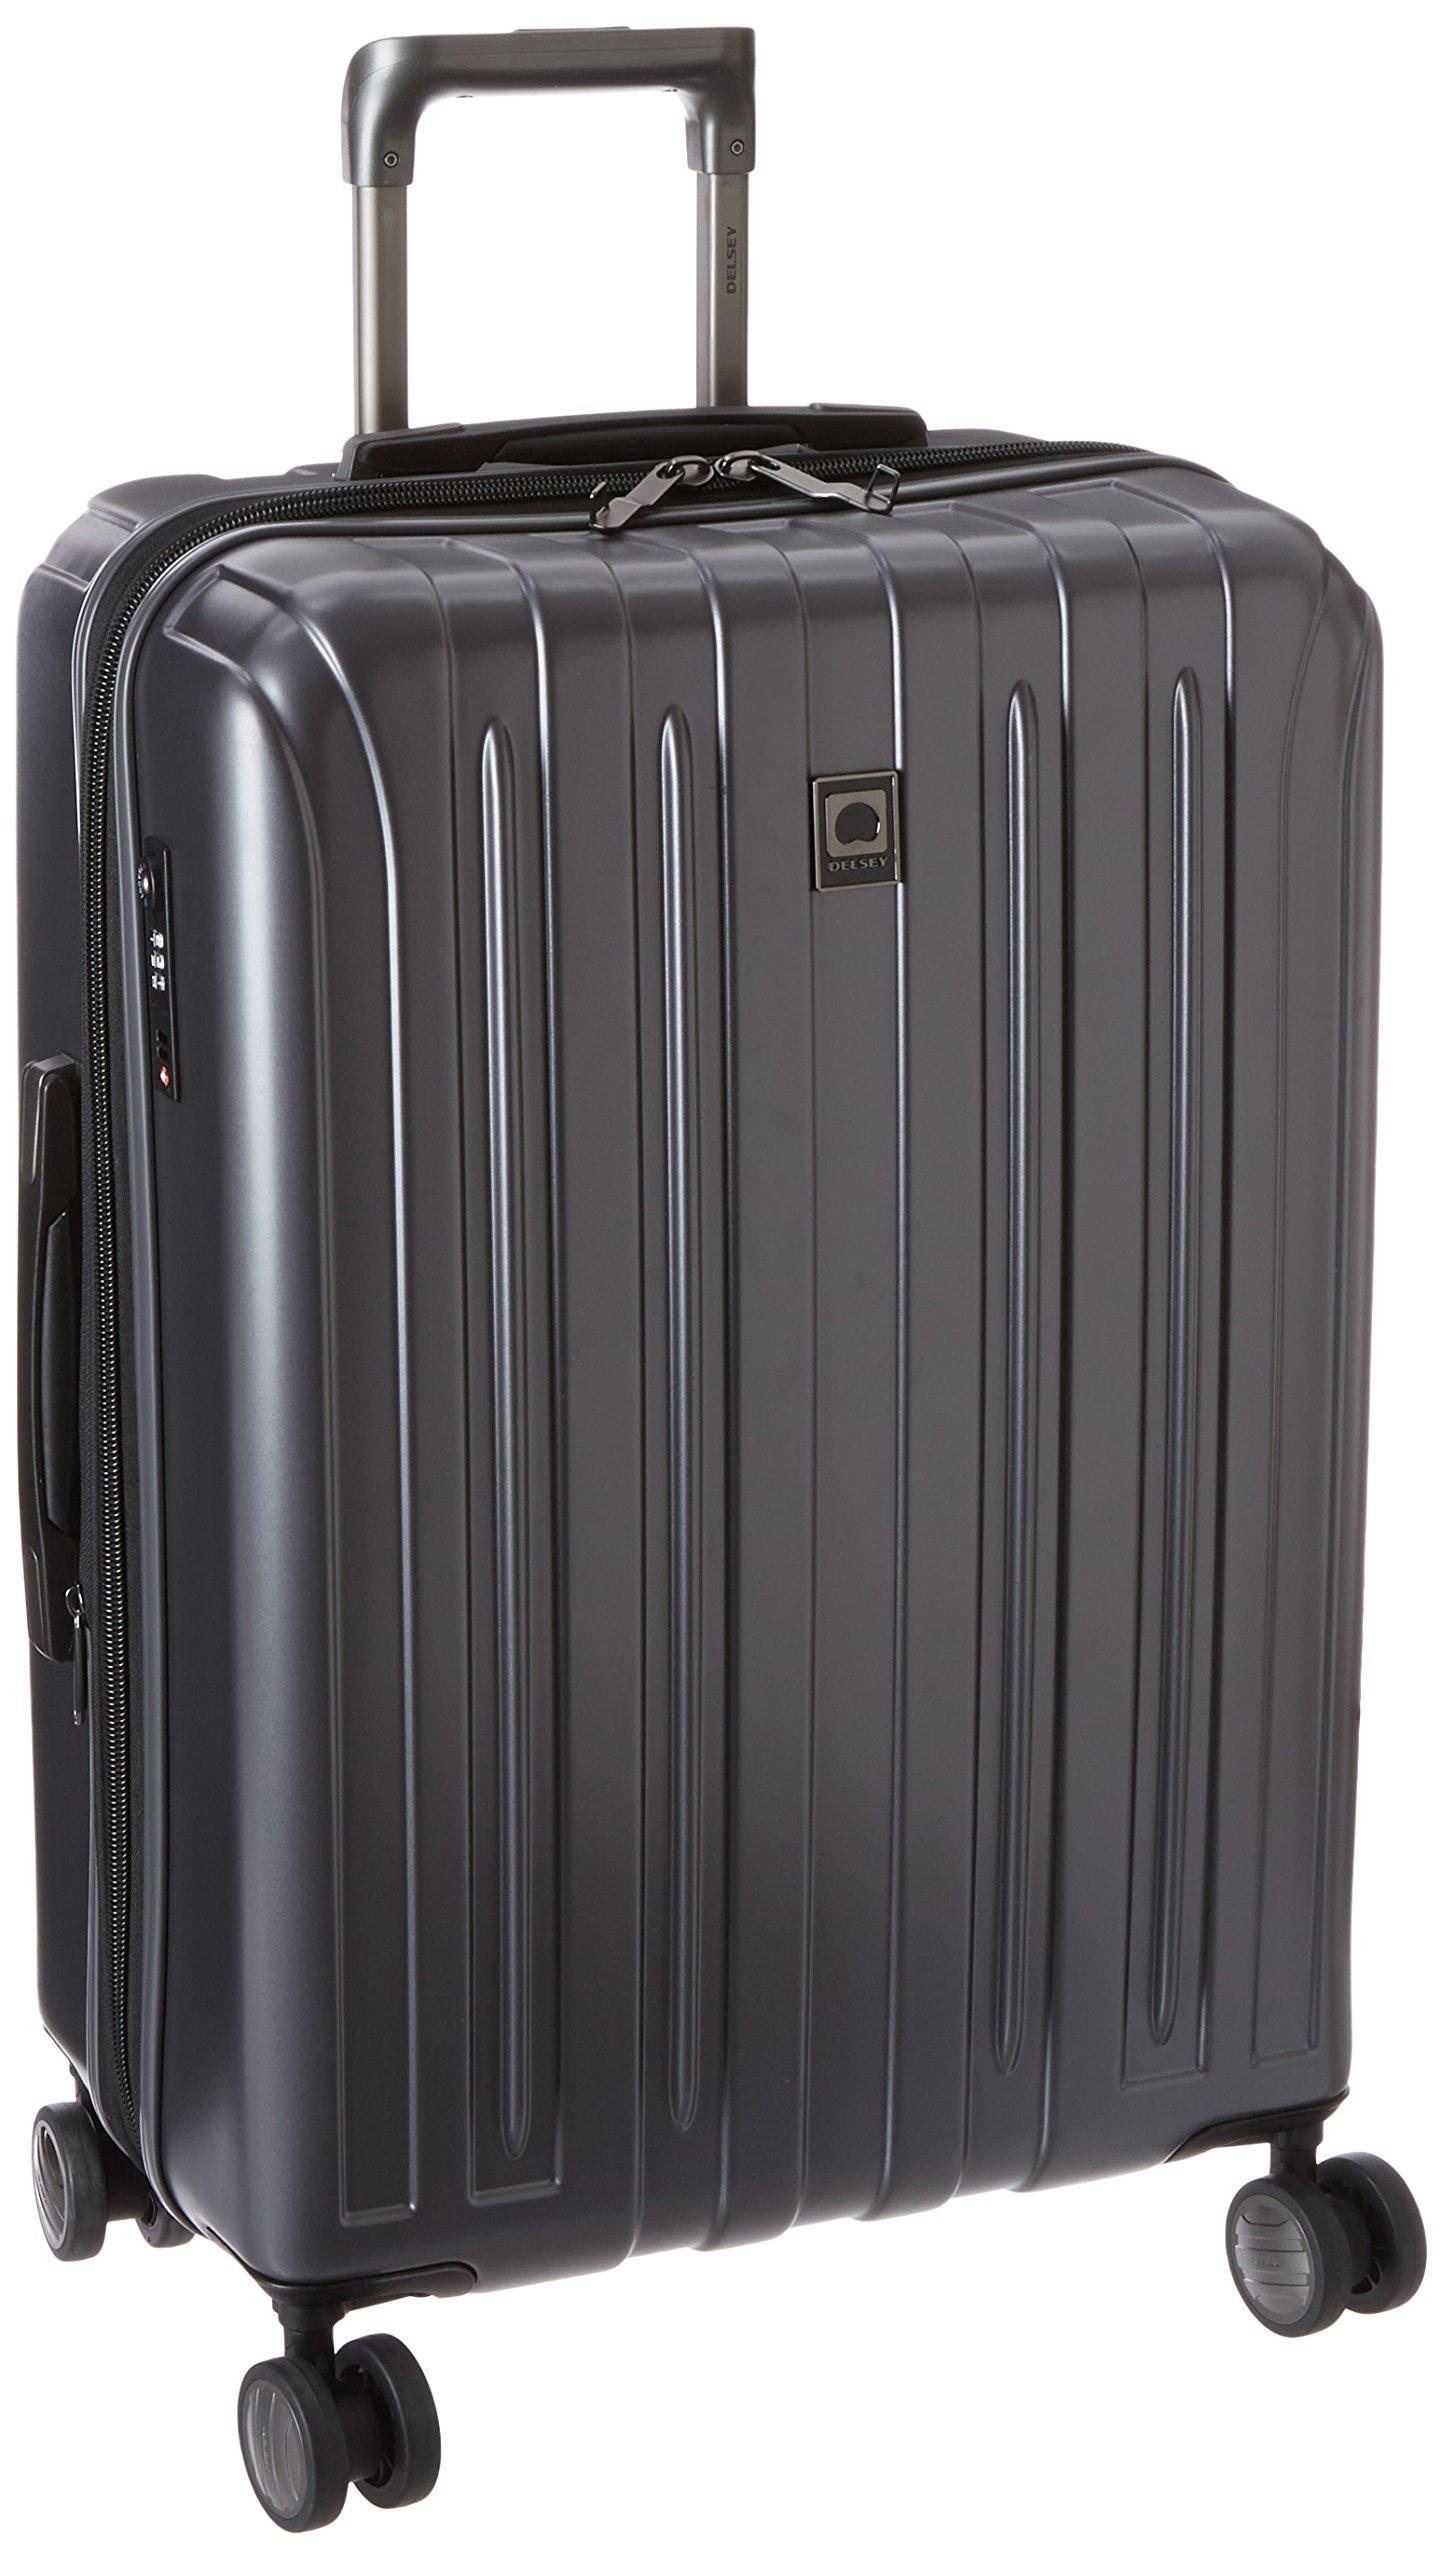 DELSEY Paris Luggage Helium Titanium 25'' Spinner Trolley Hard Case Suitcase, Graphite One Size